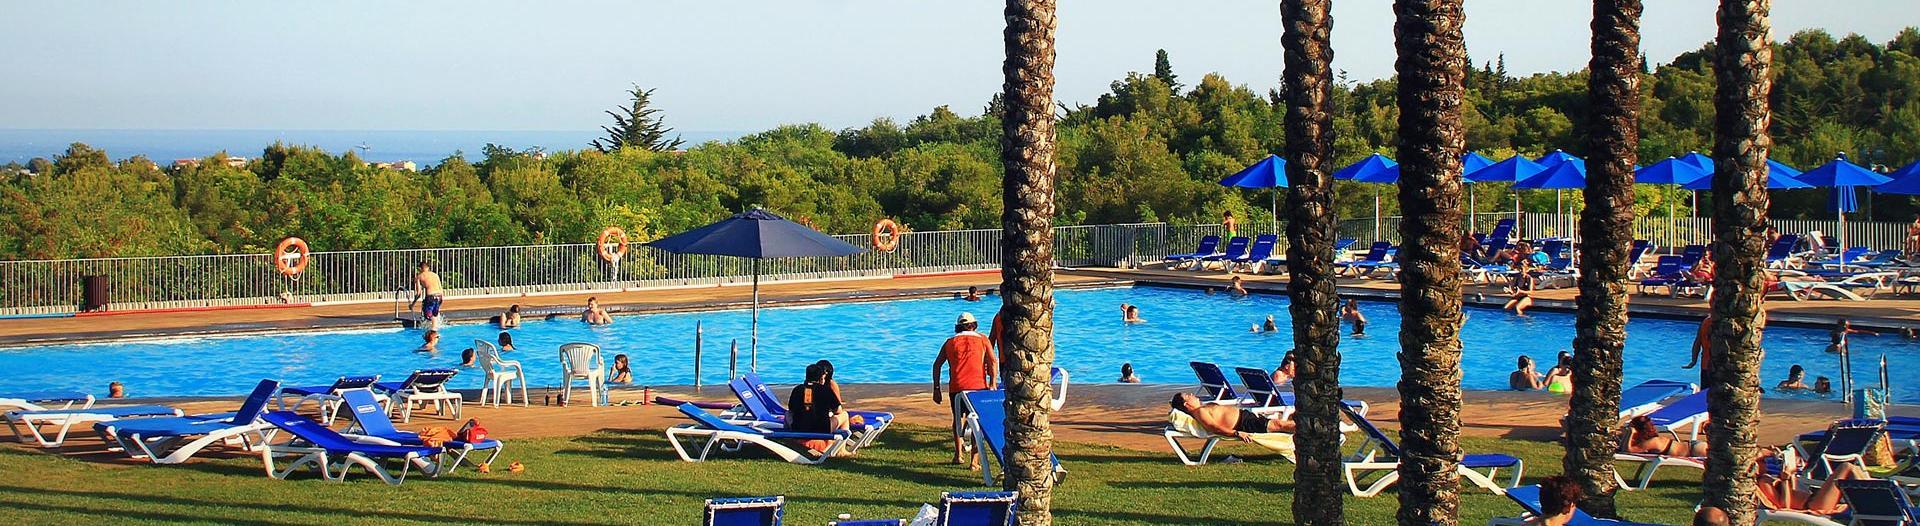 slider-camping-vilanova-park-costa-dorada-parc-aquatique